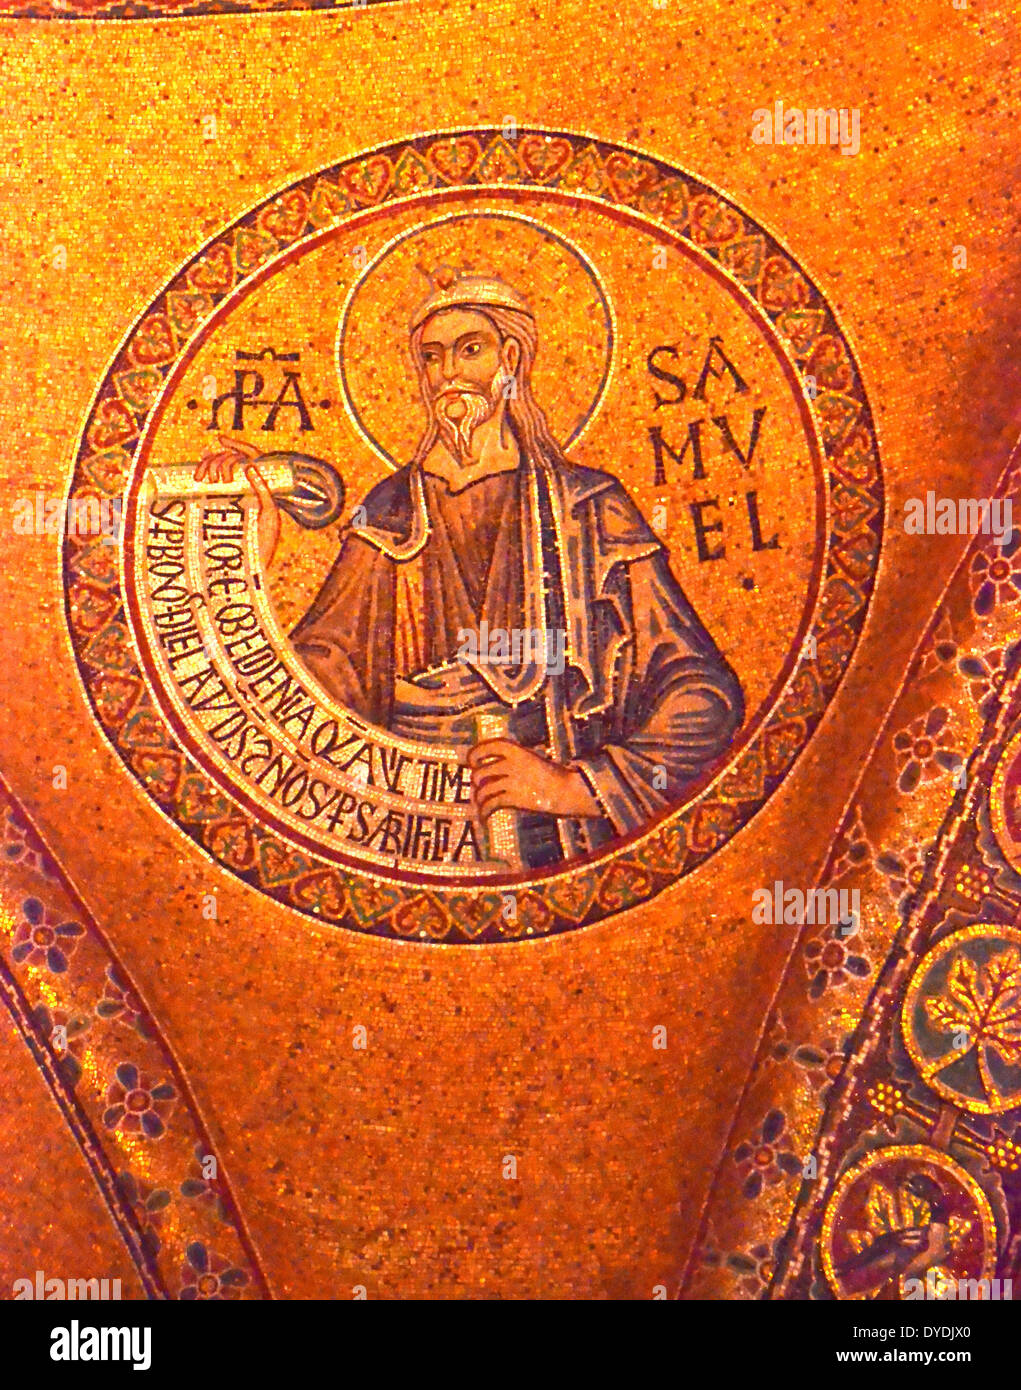 treasure gold priceless art st mark's basilica Venice Italy pure gold religious craftsmanship skill image icon byzantine Co - Stock Image